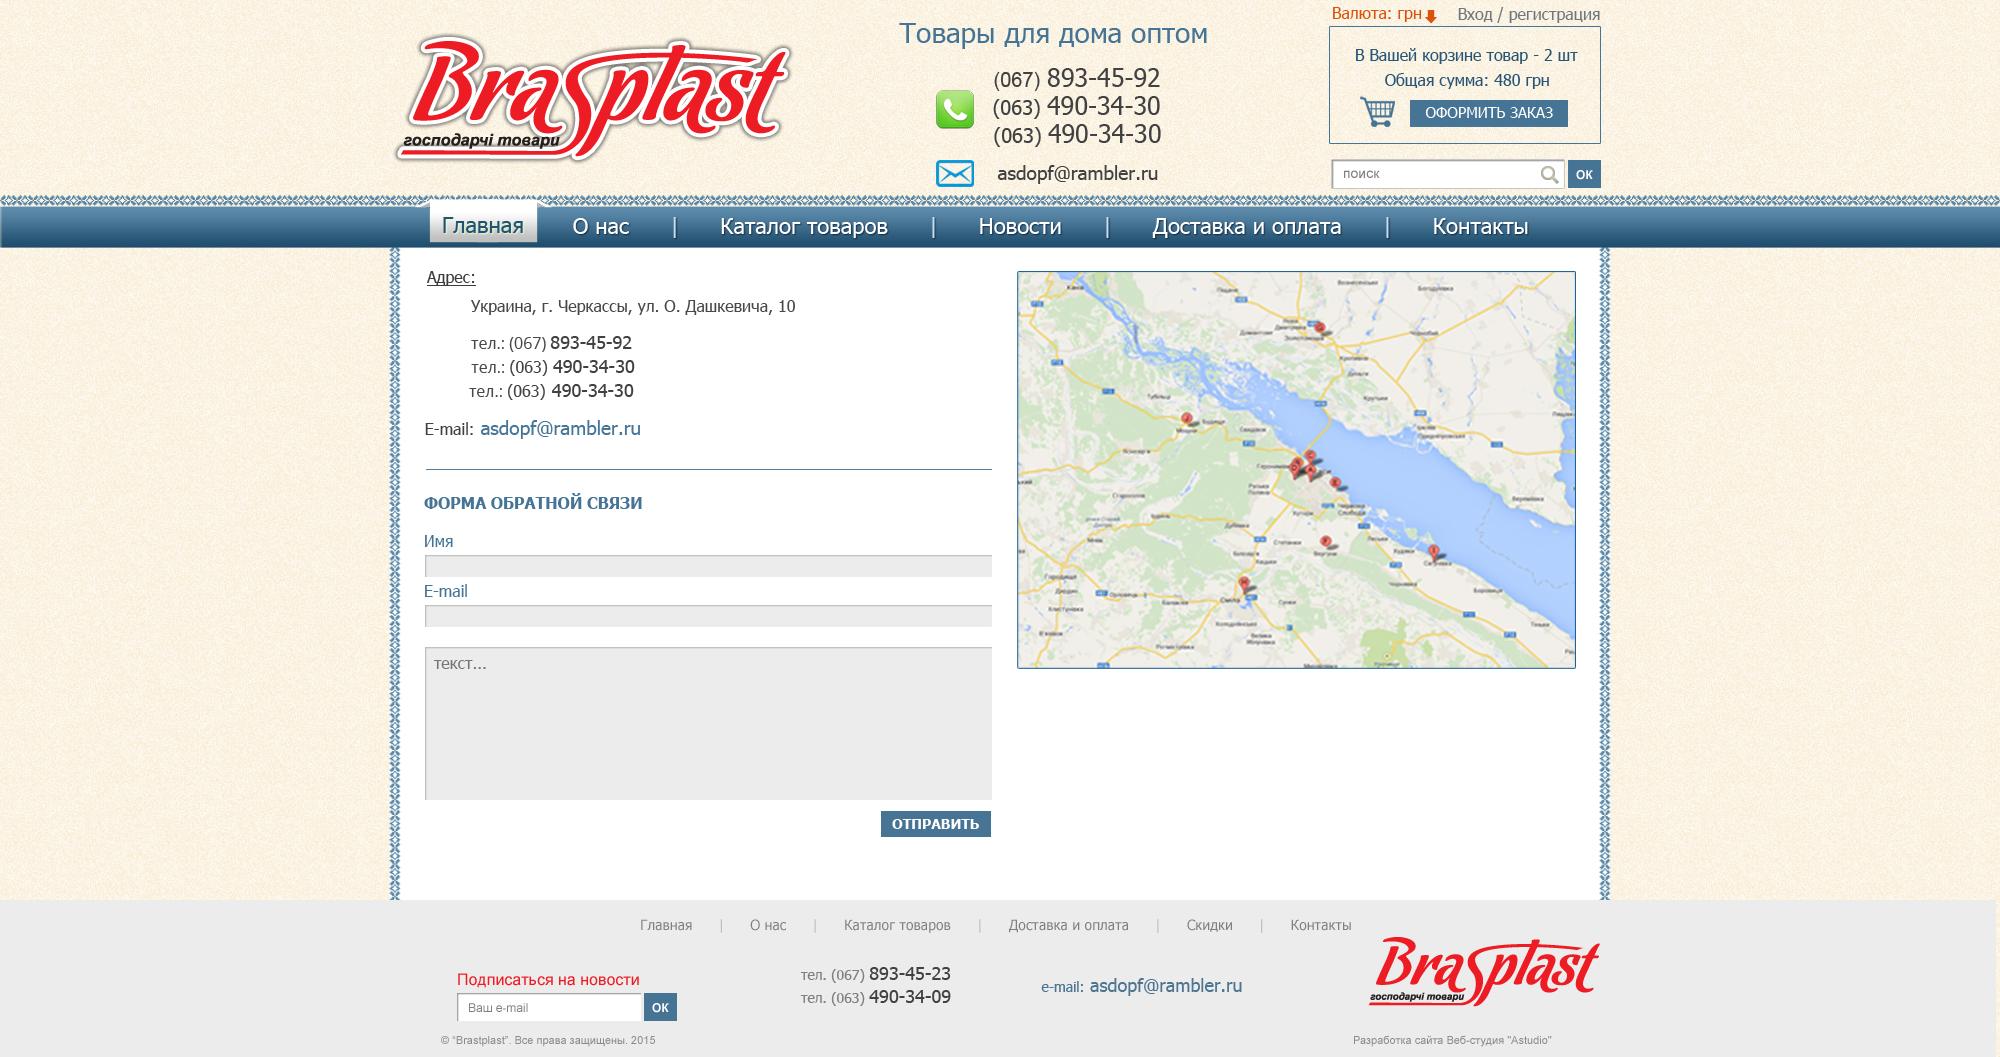 Верстка интернет-магазина Brasplast